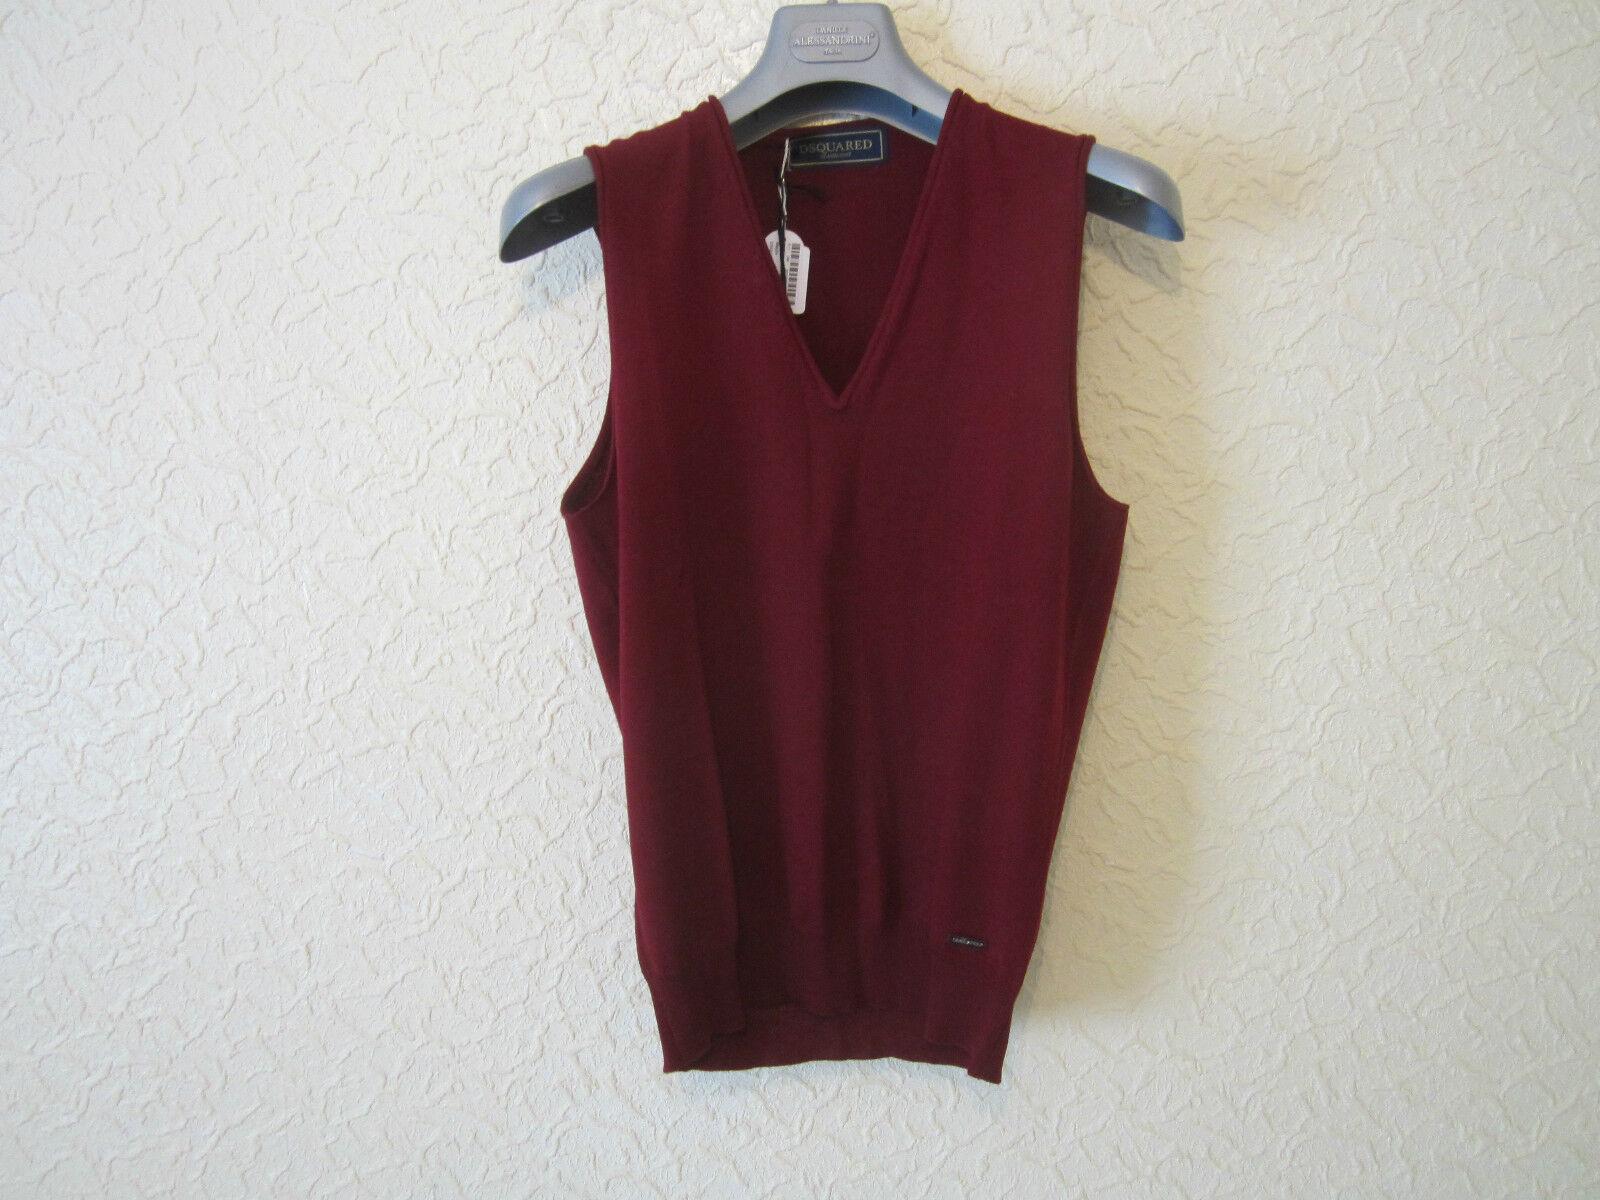 D'Squarot Classic Knit wolleSleeveless schweißer Vest